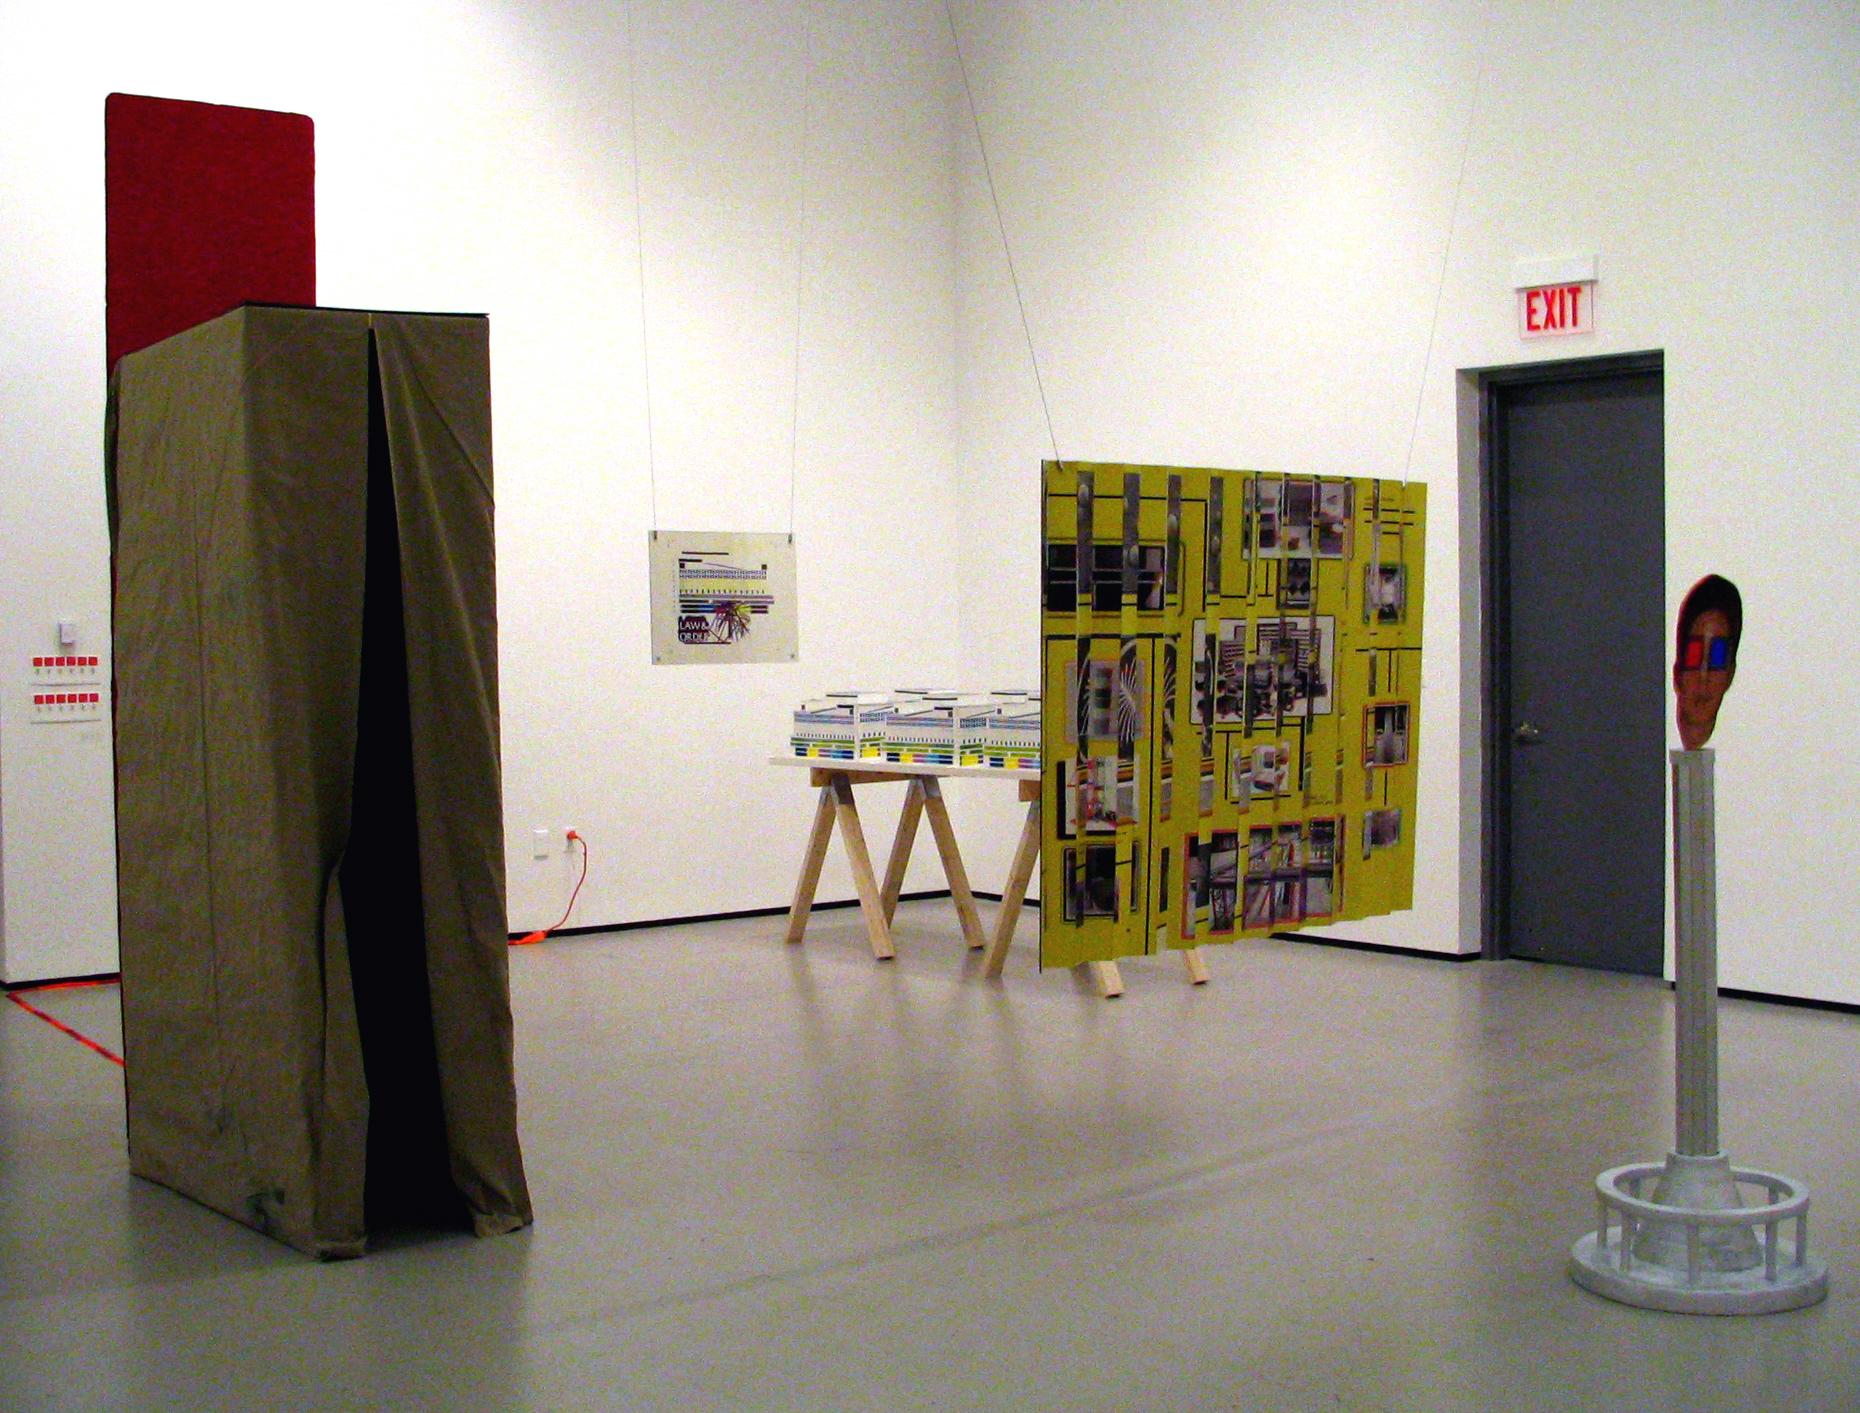 26-thesis installation.jpg